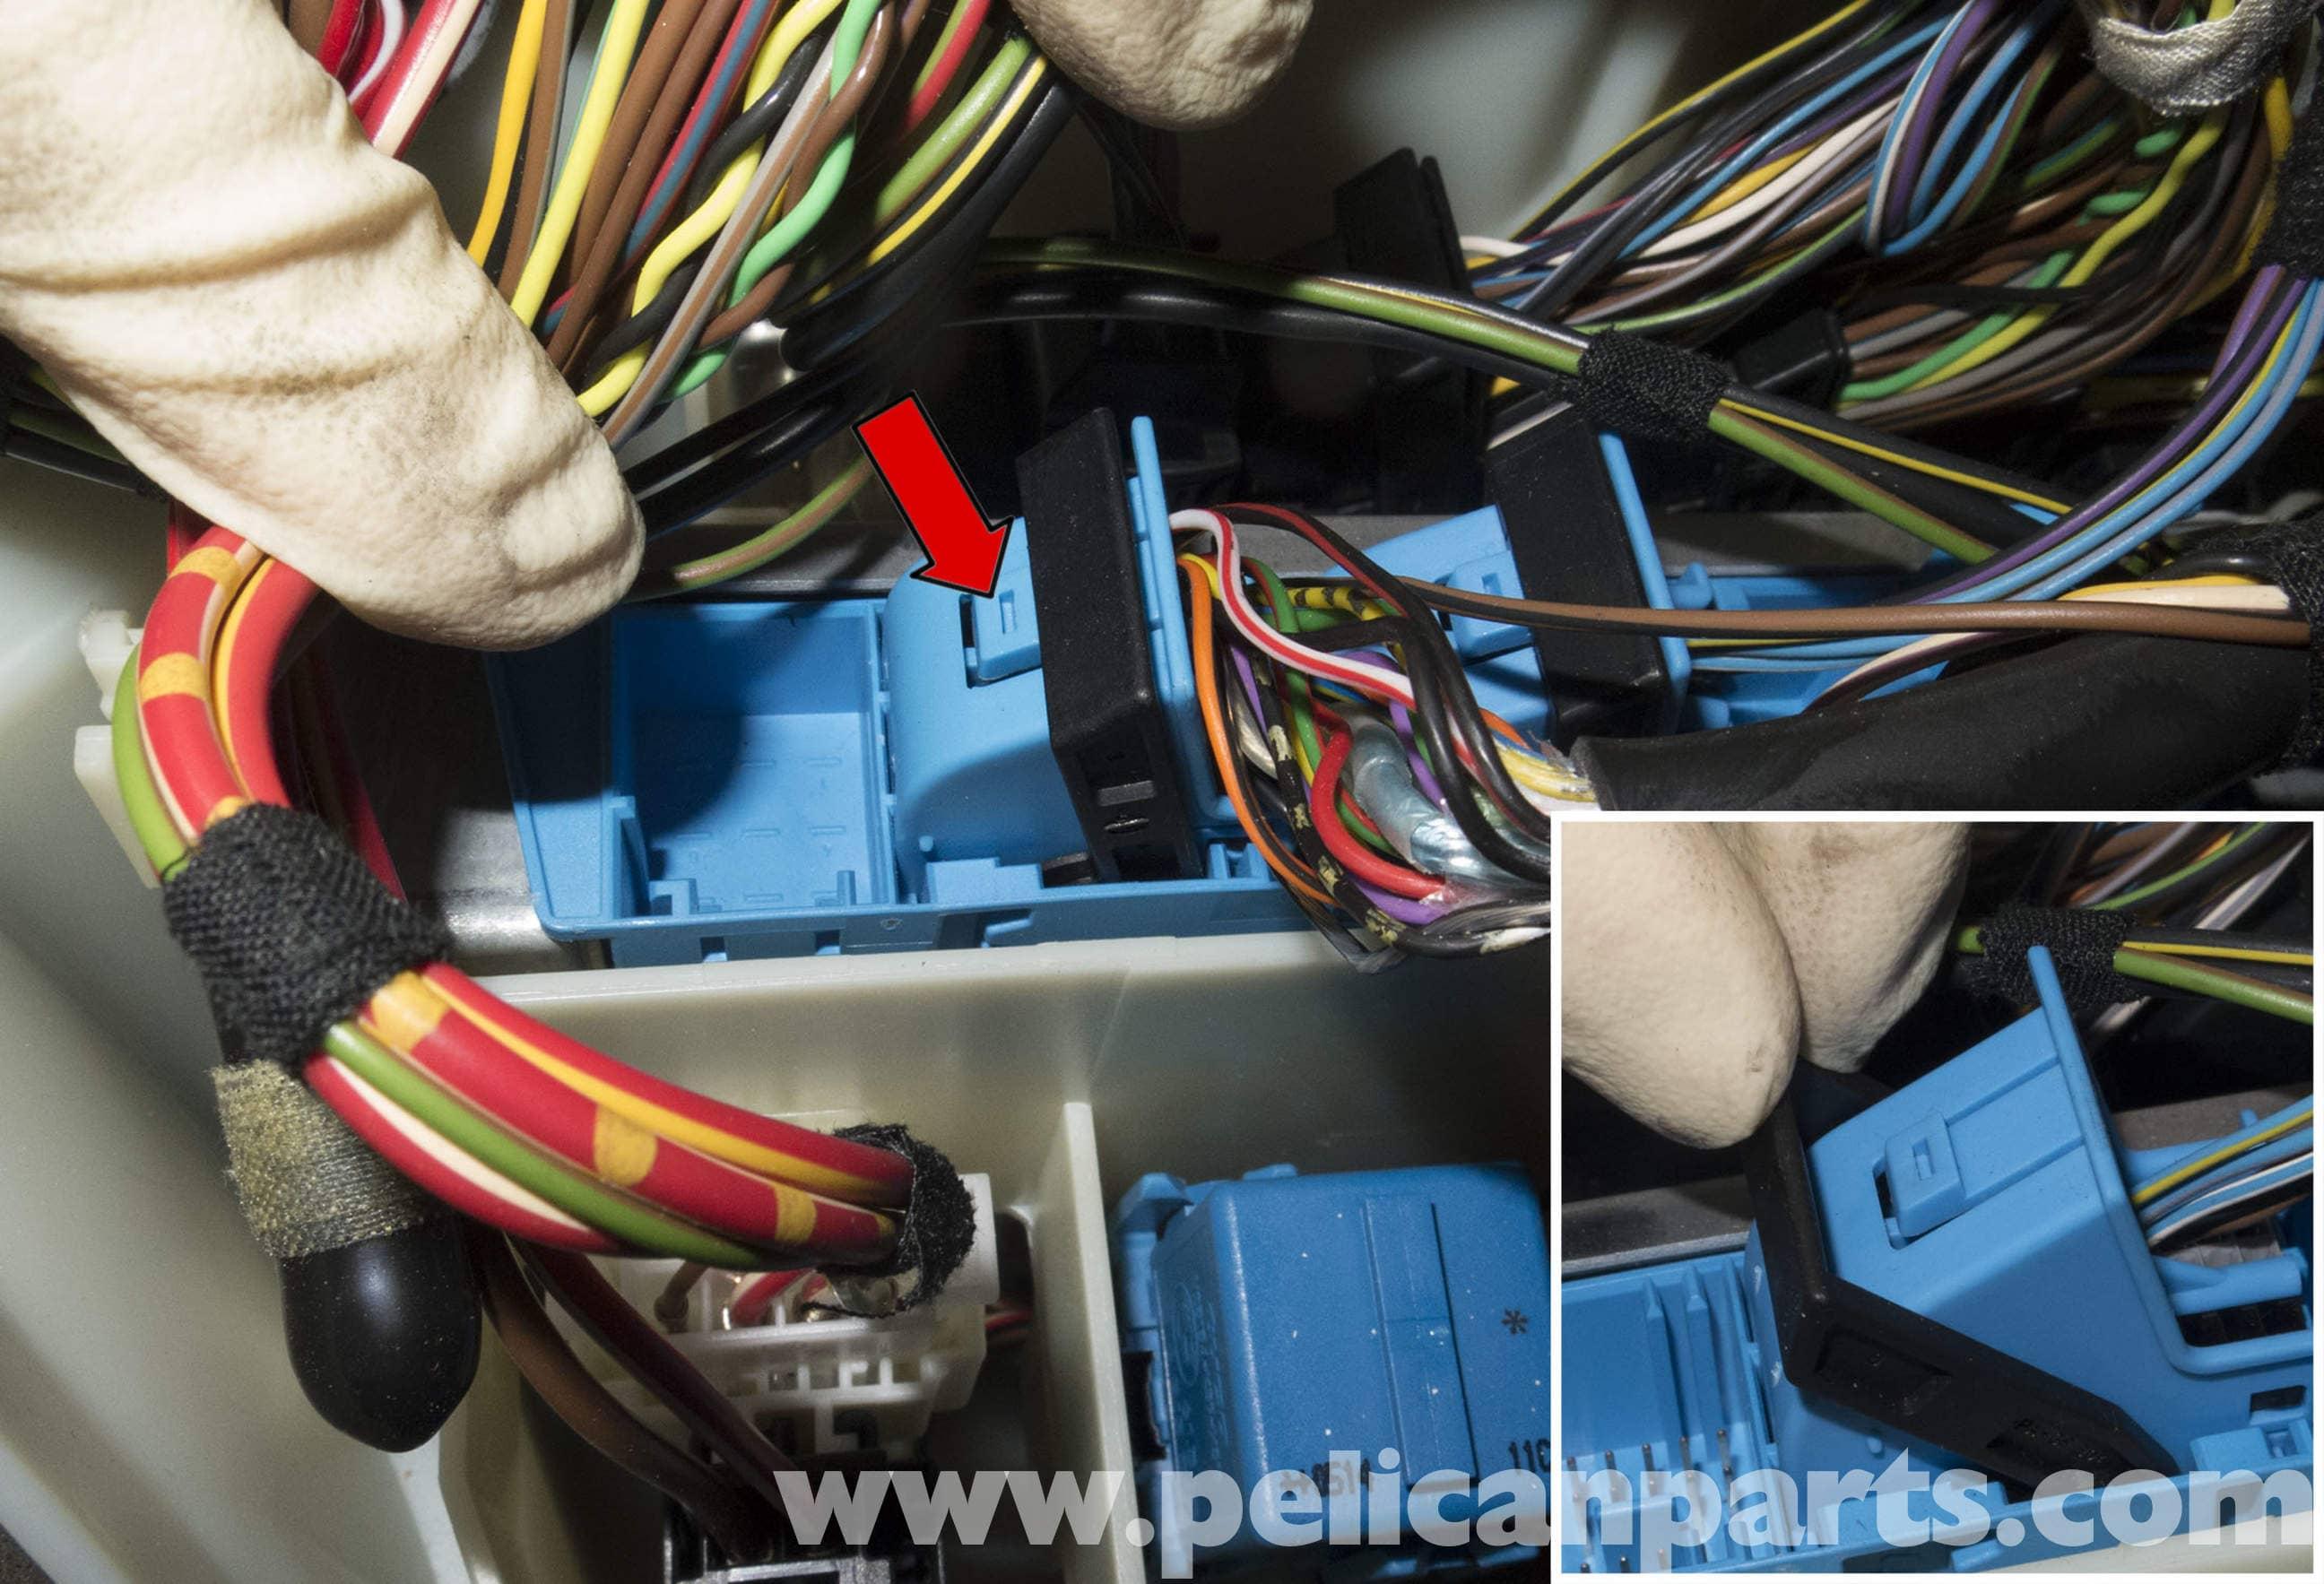 Pelican Parts Technical Article - BMW-X3 - DME (engine